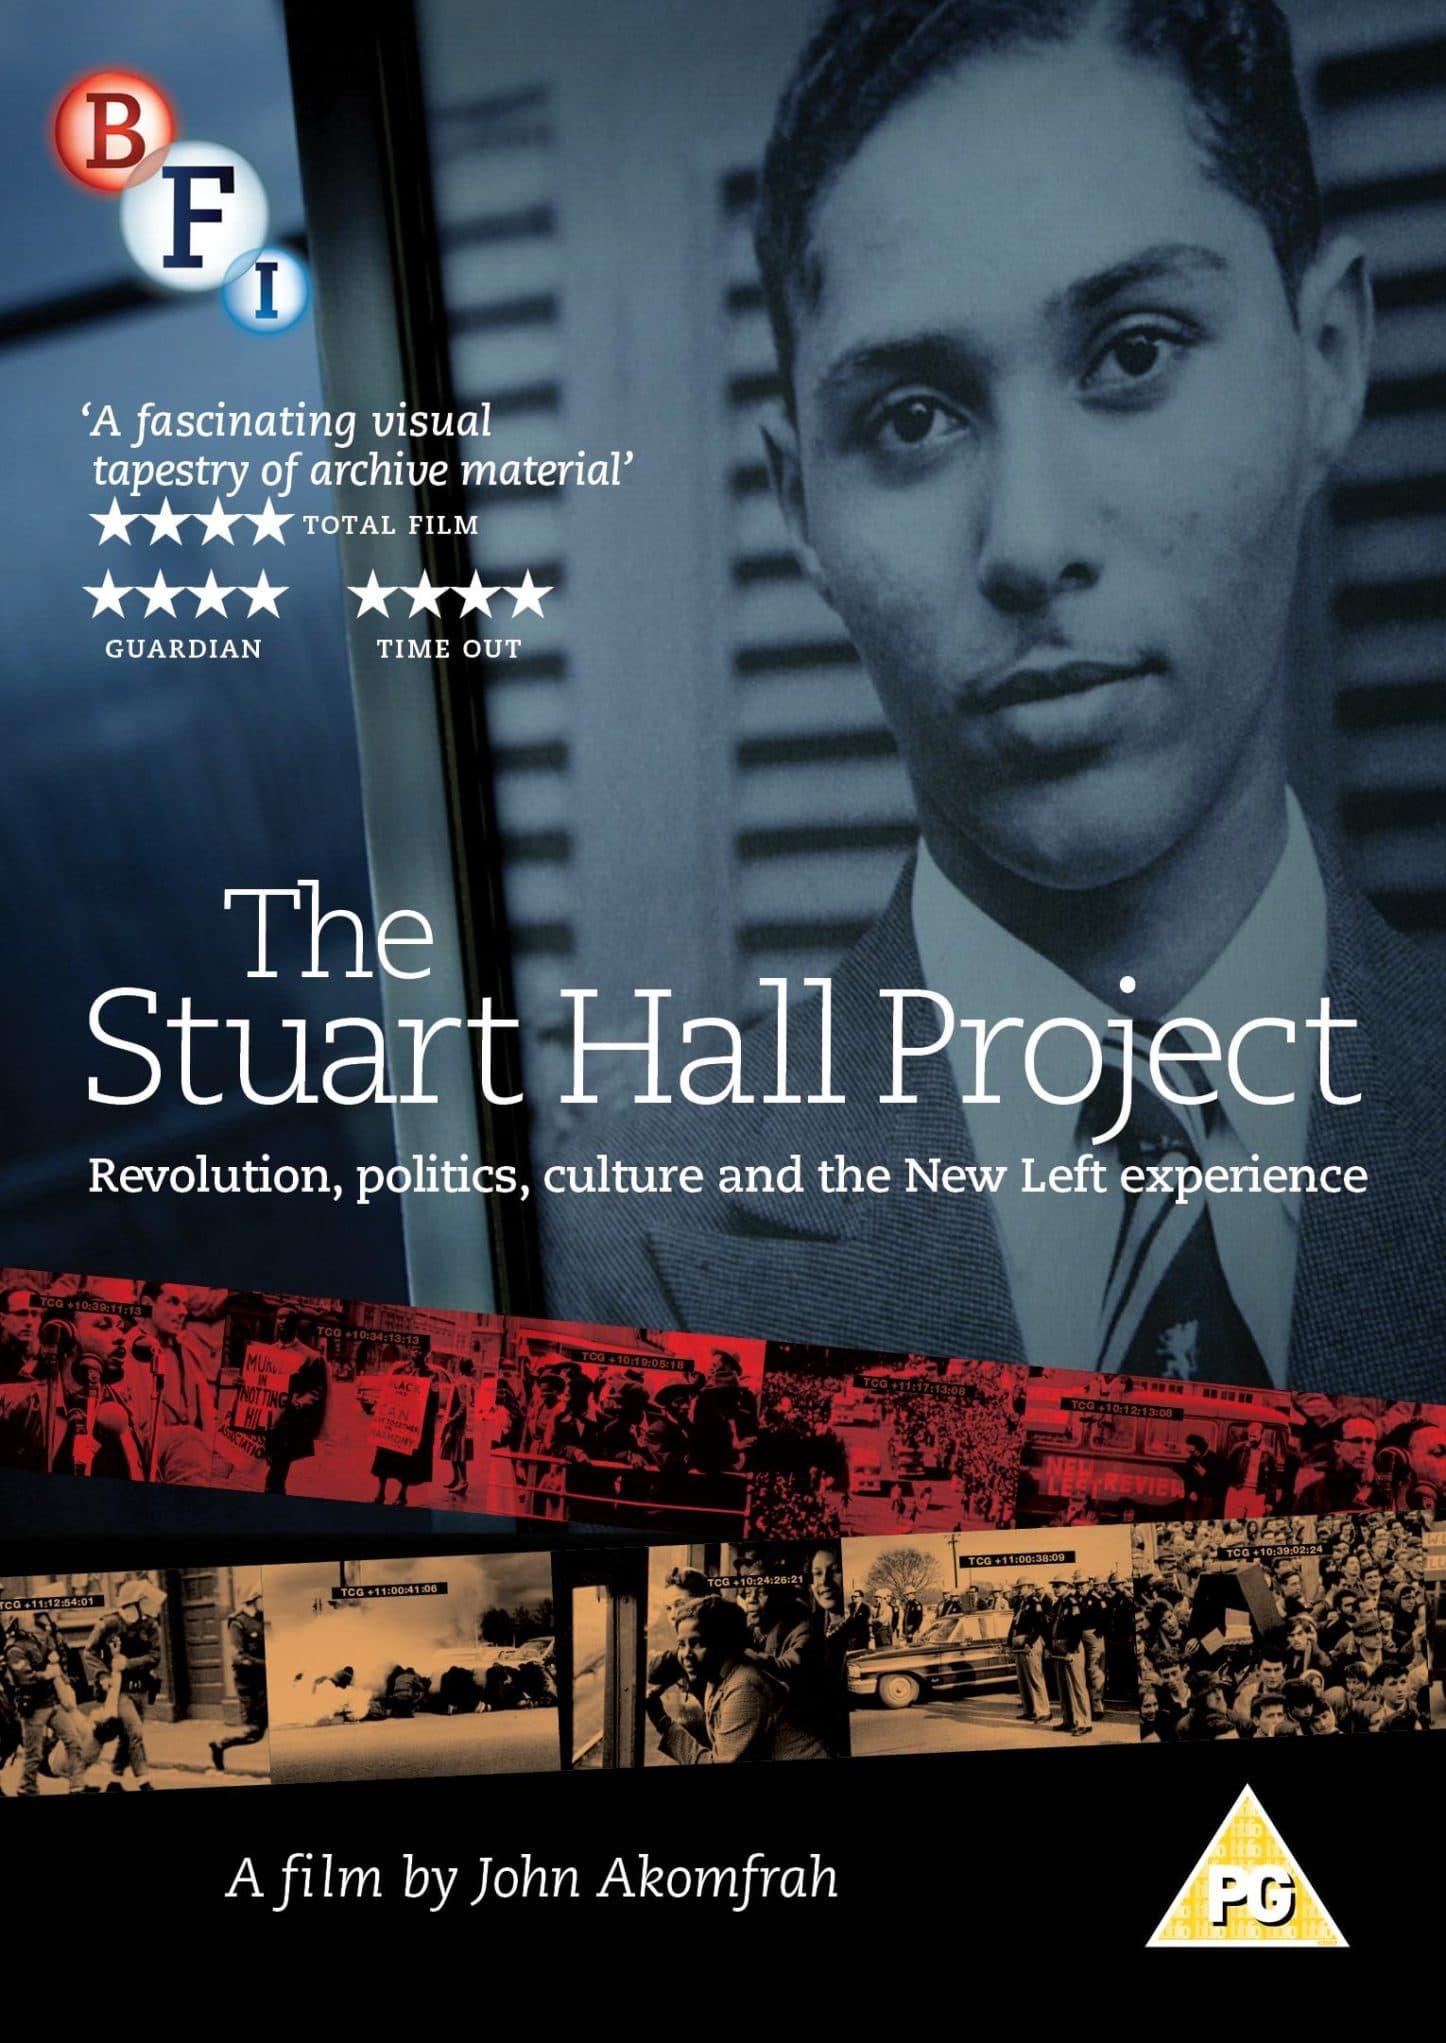 MAN MET BLACK HISTORY MONTH 2017 - Screening of: 'The Stuart Hall Project'. | Blacknet UK